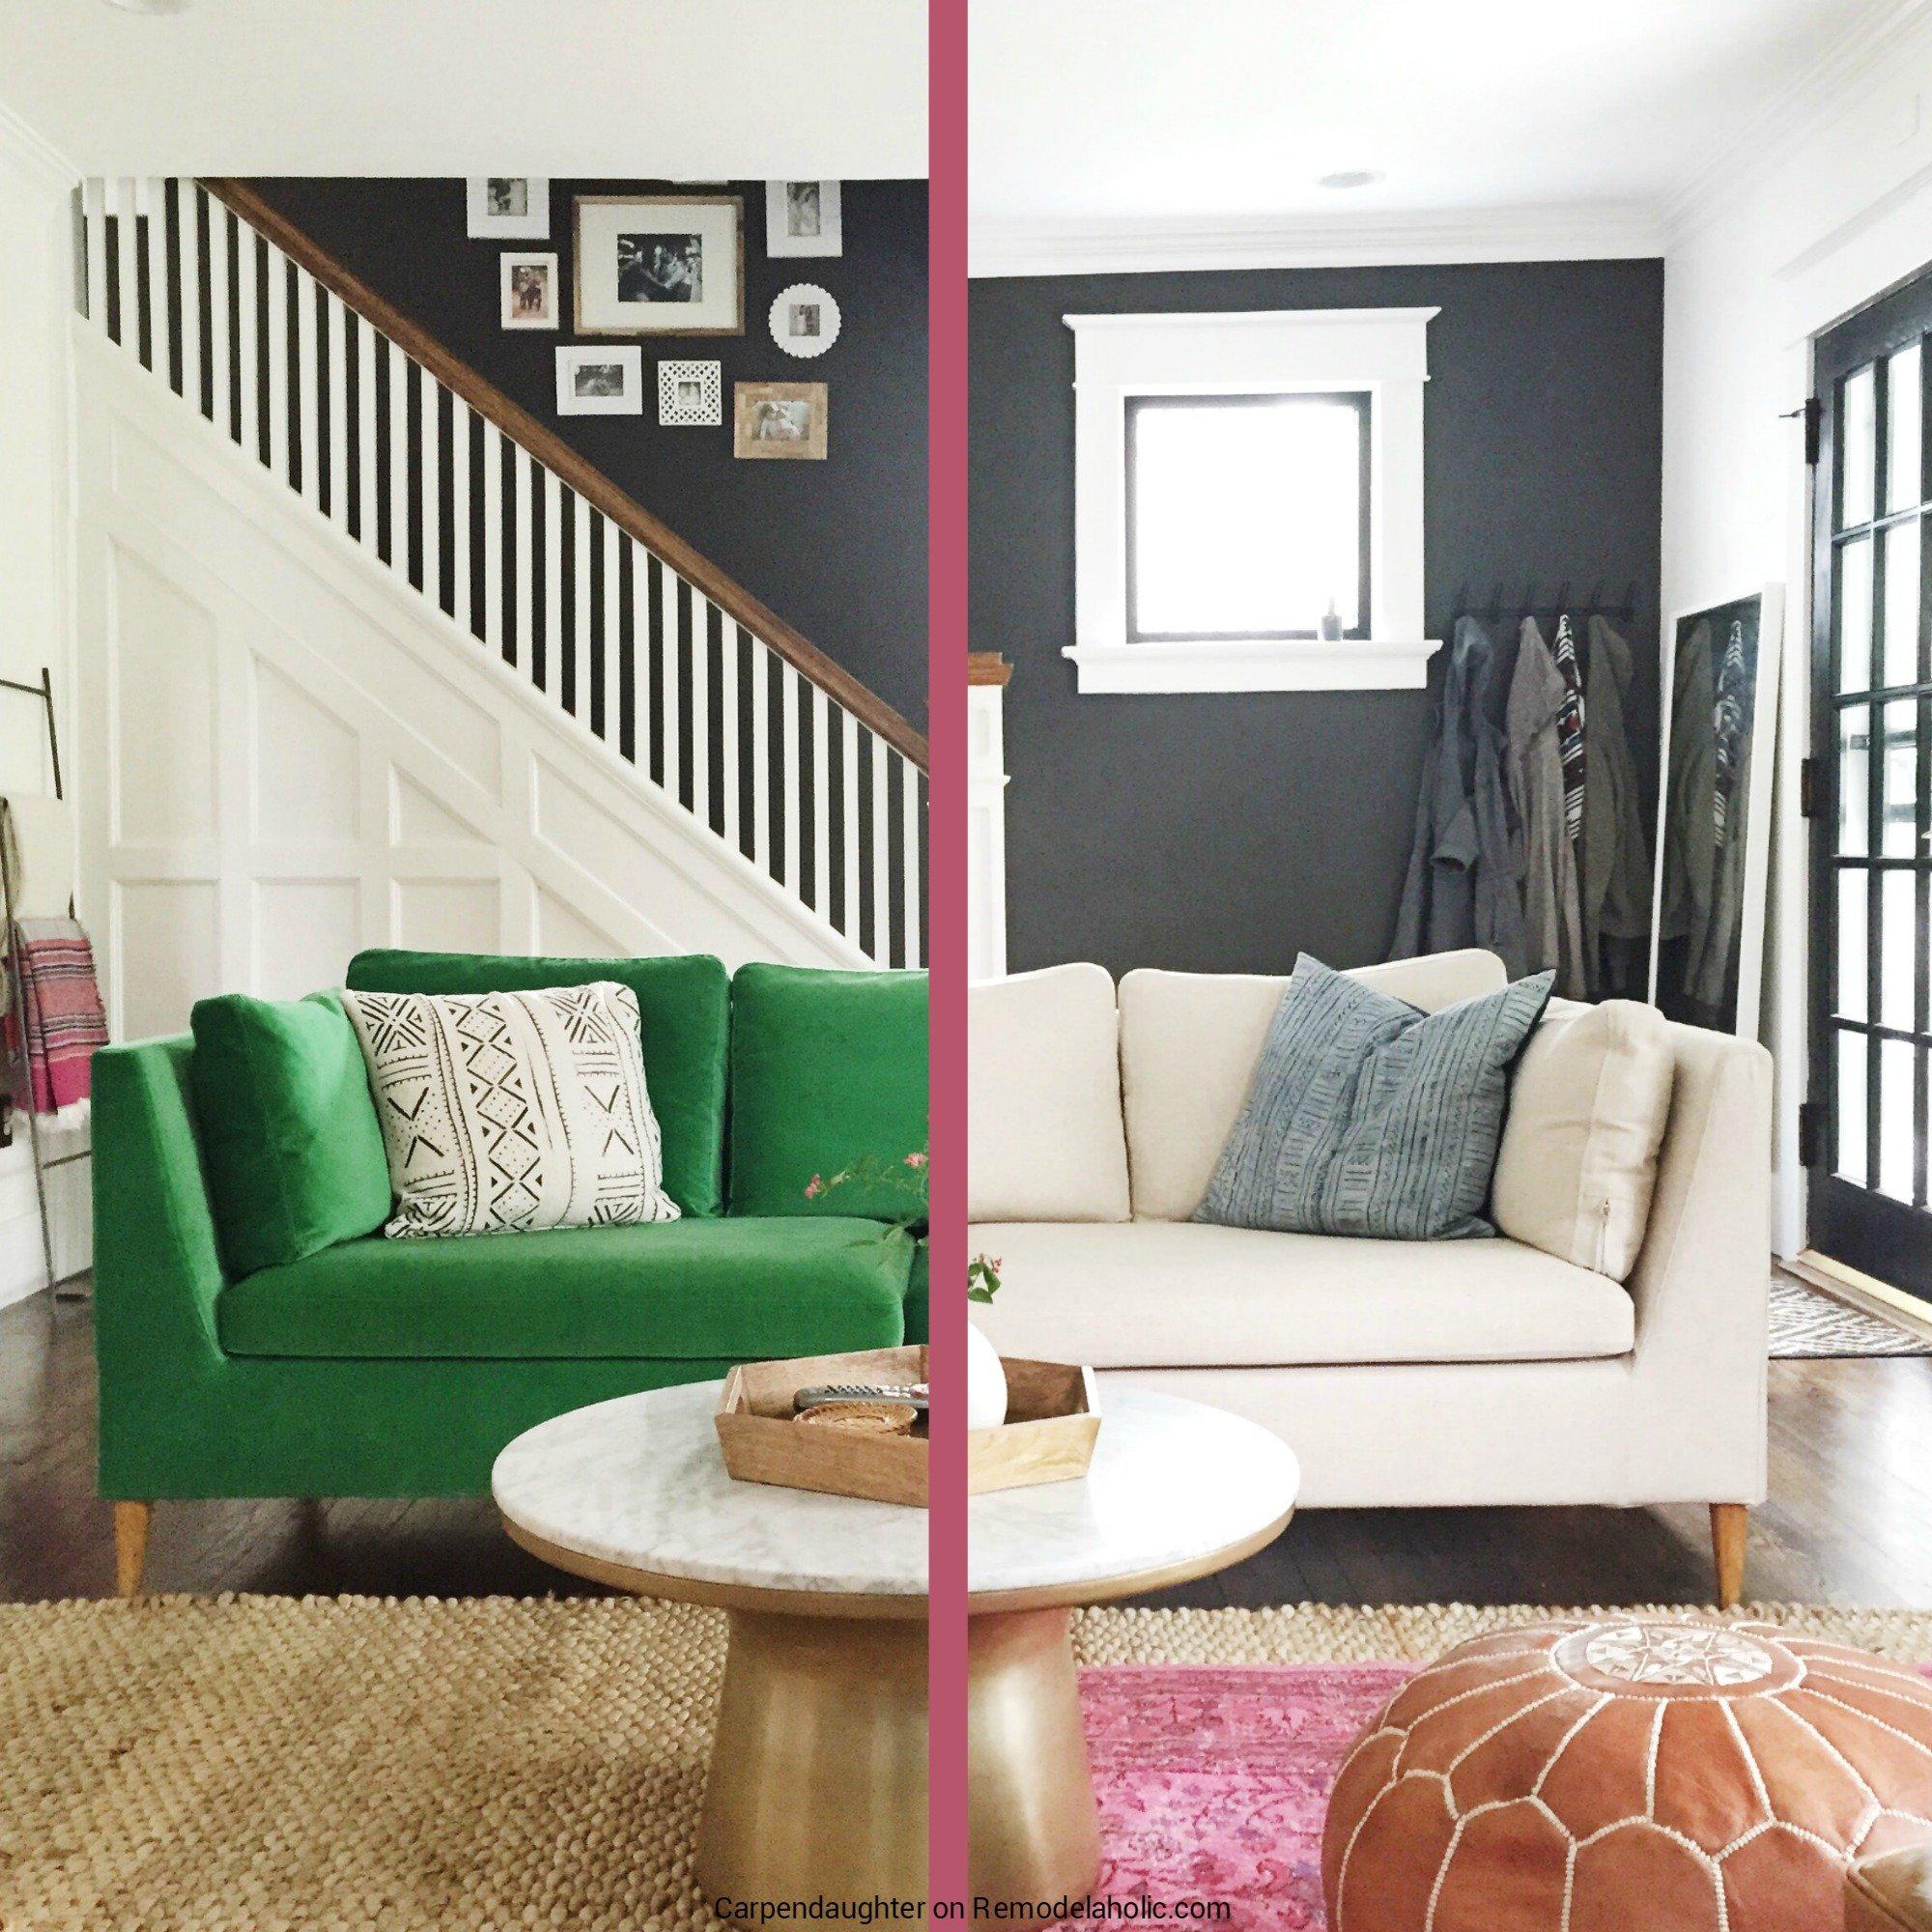 Remodelaholic Easily Change a Room with a Custom IKEA Sofa Slipcover